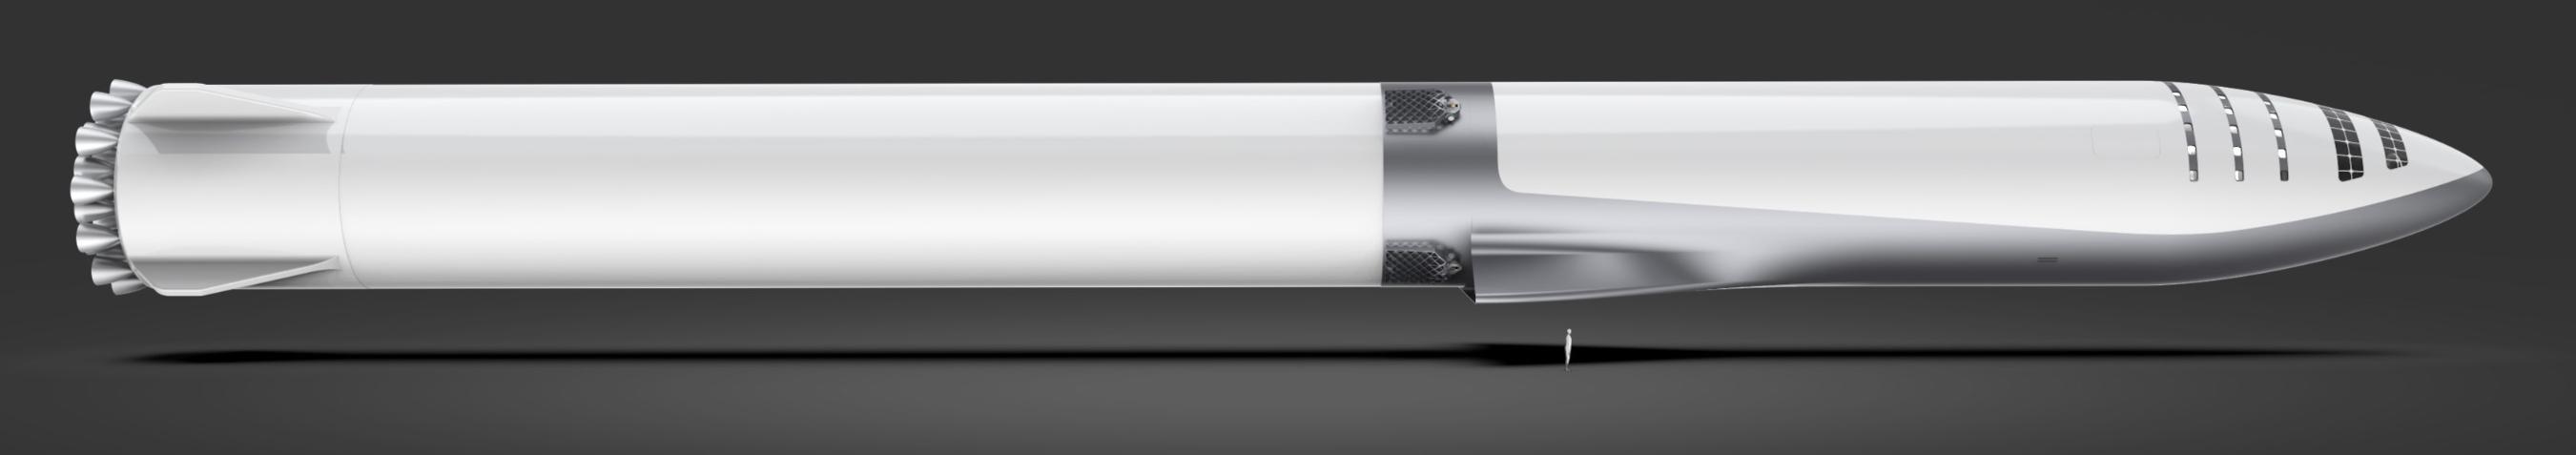 BFR stack(c)